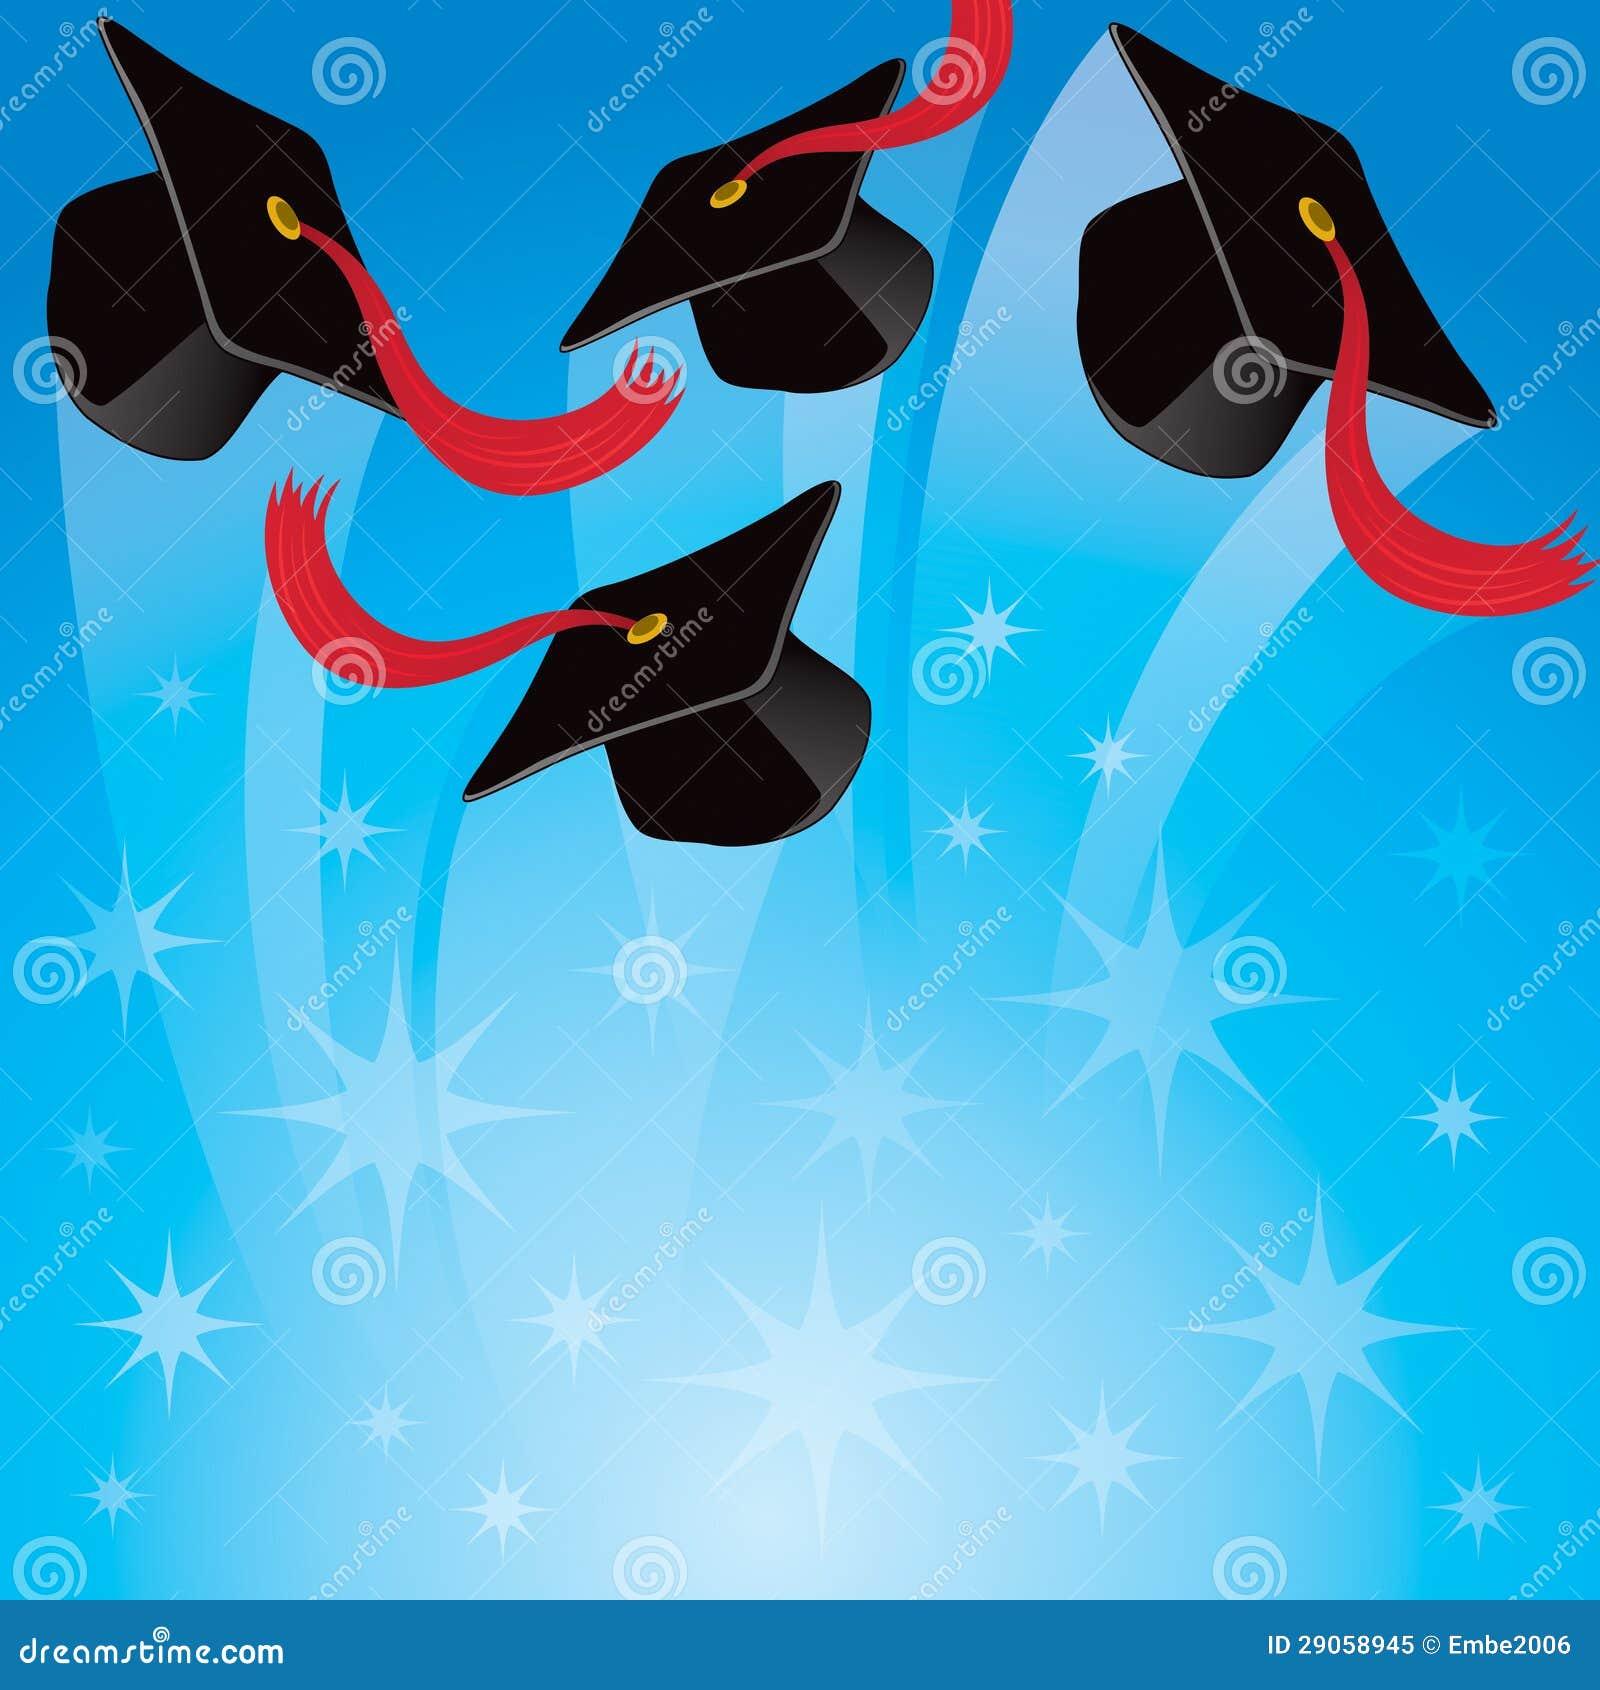 Graduation Background Stock Illustrations – 24,212 ...